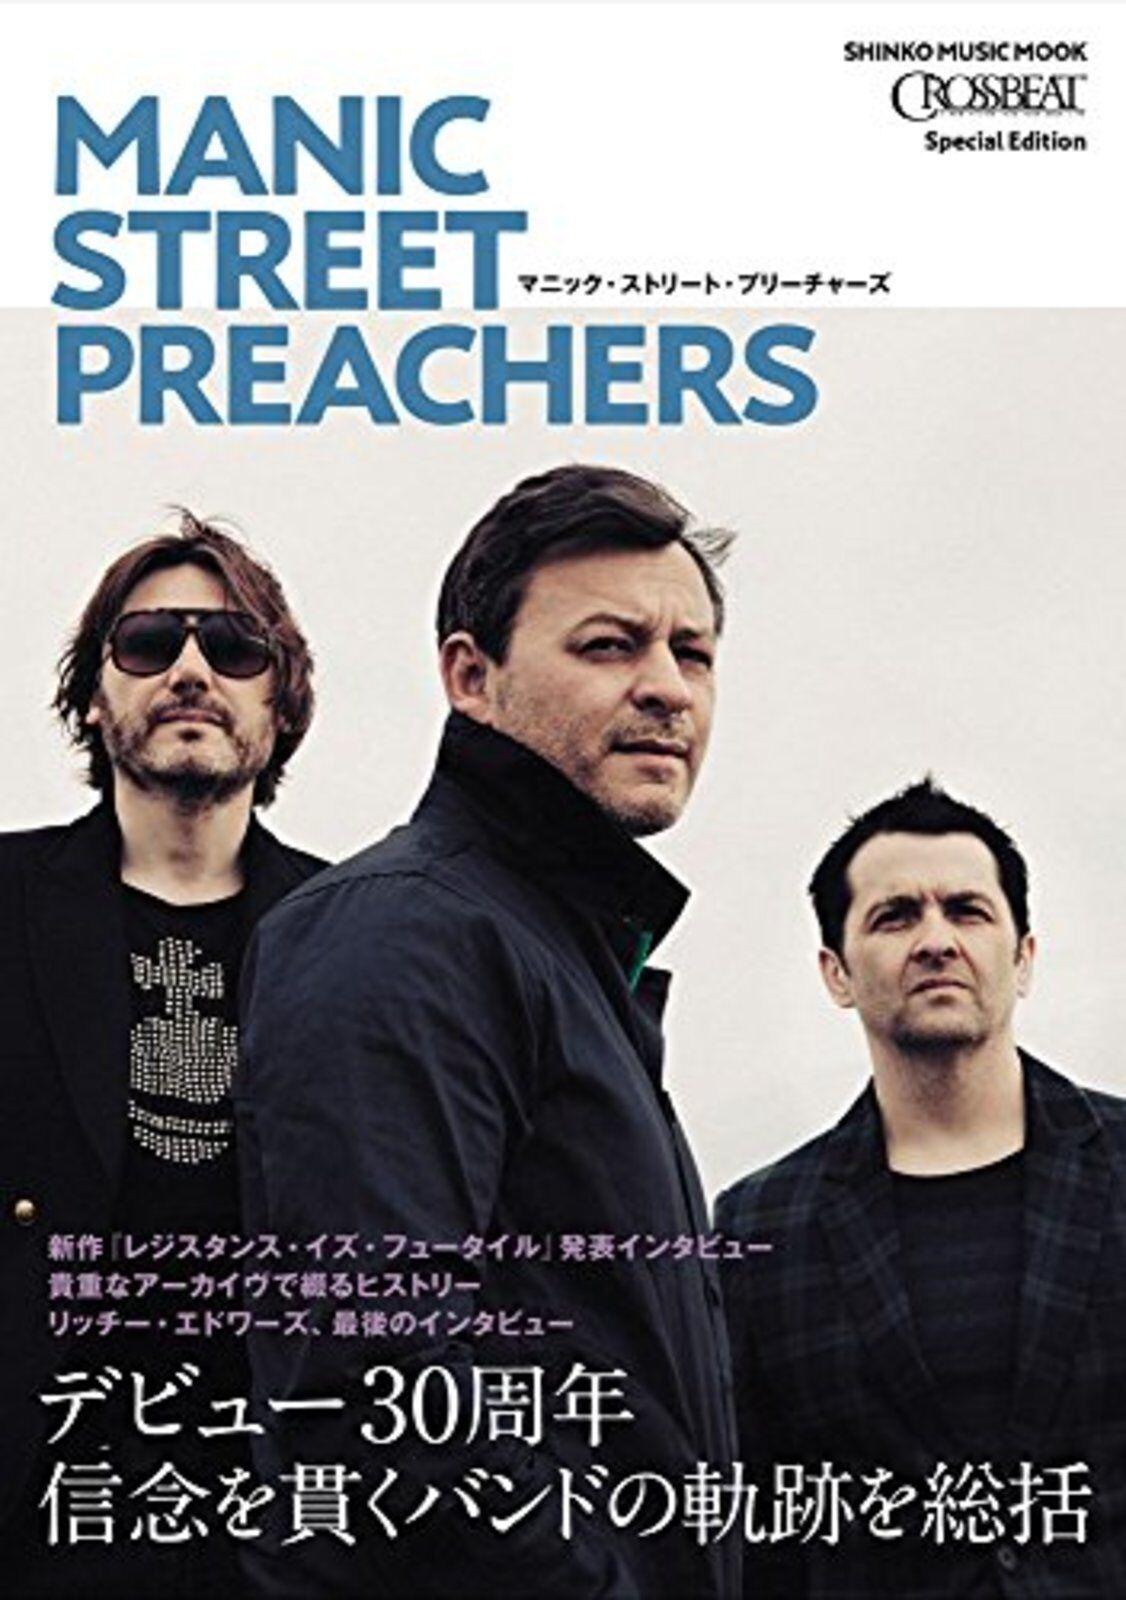 Manic Street Preachers Japanese Magazine CROSSBEAT Special Edition 2018